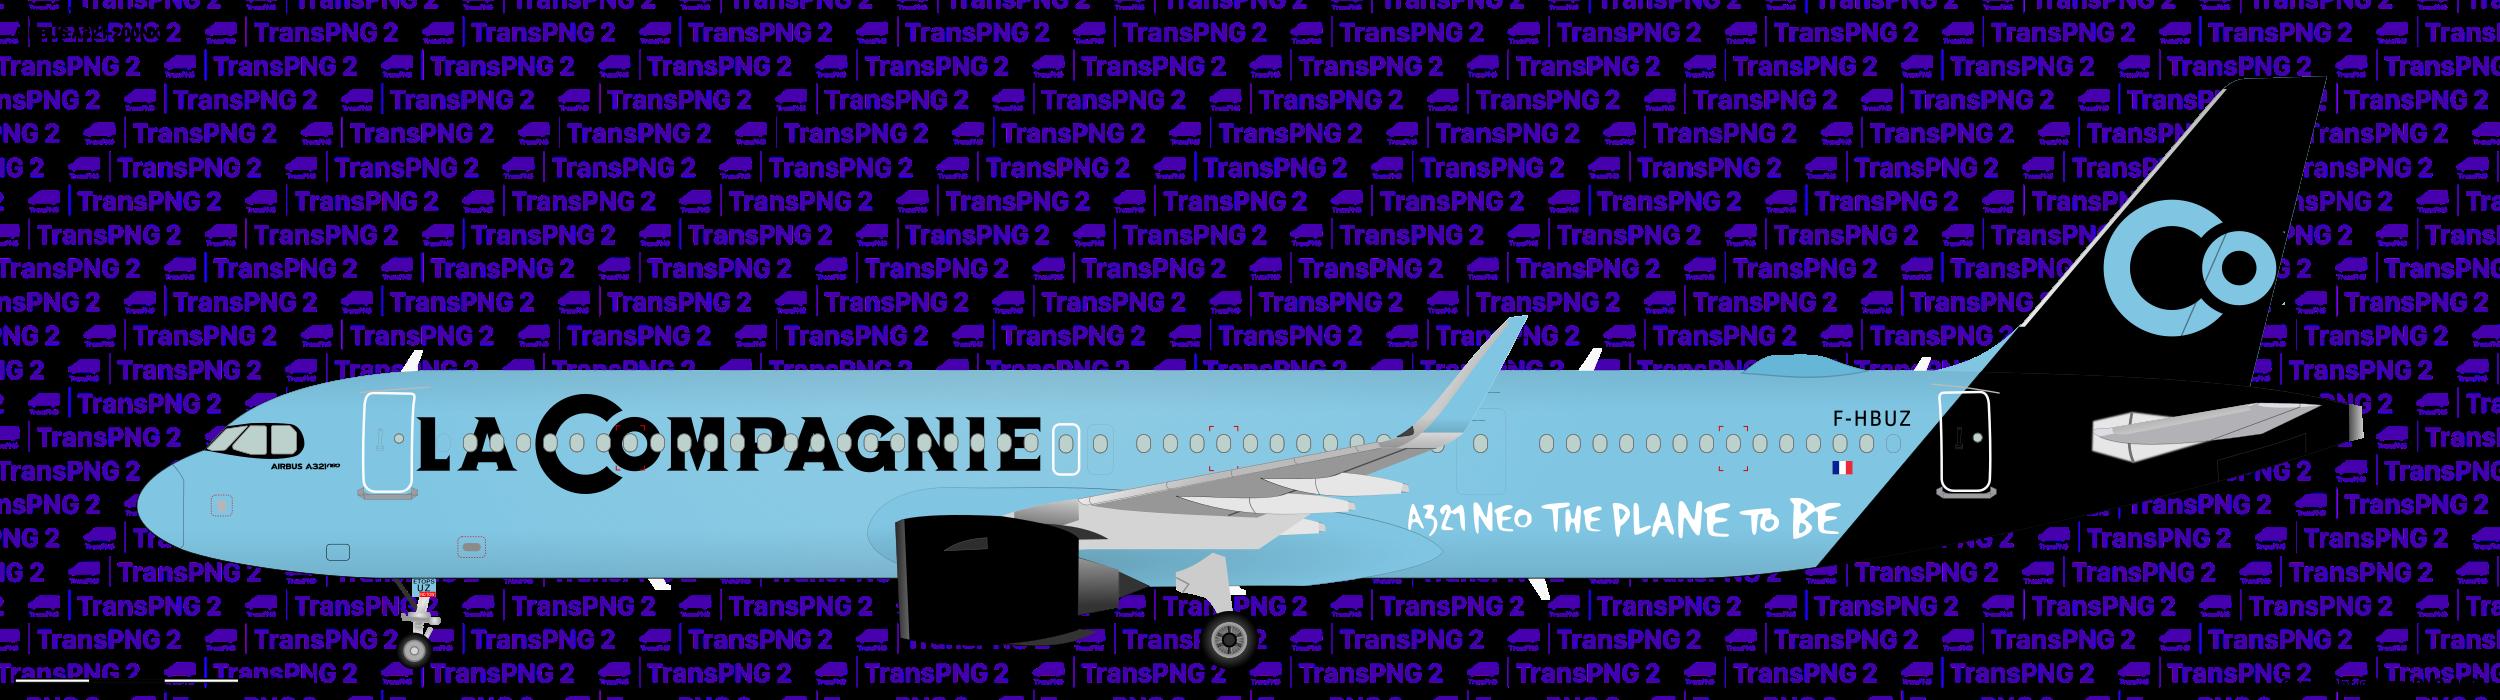 [25128] DreamJet 25128